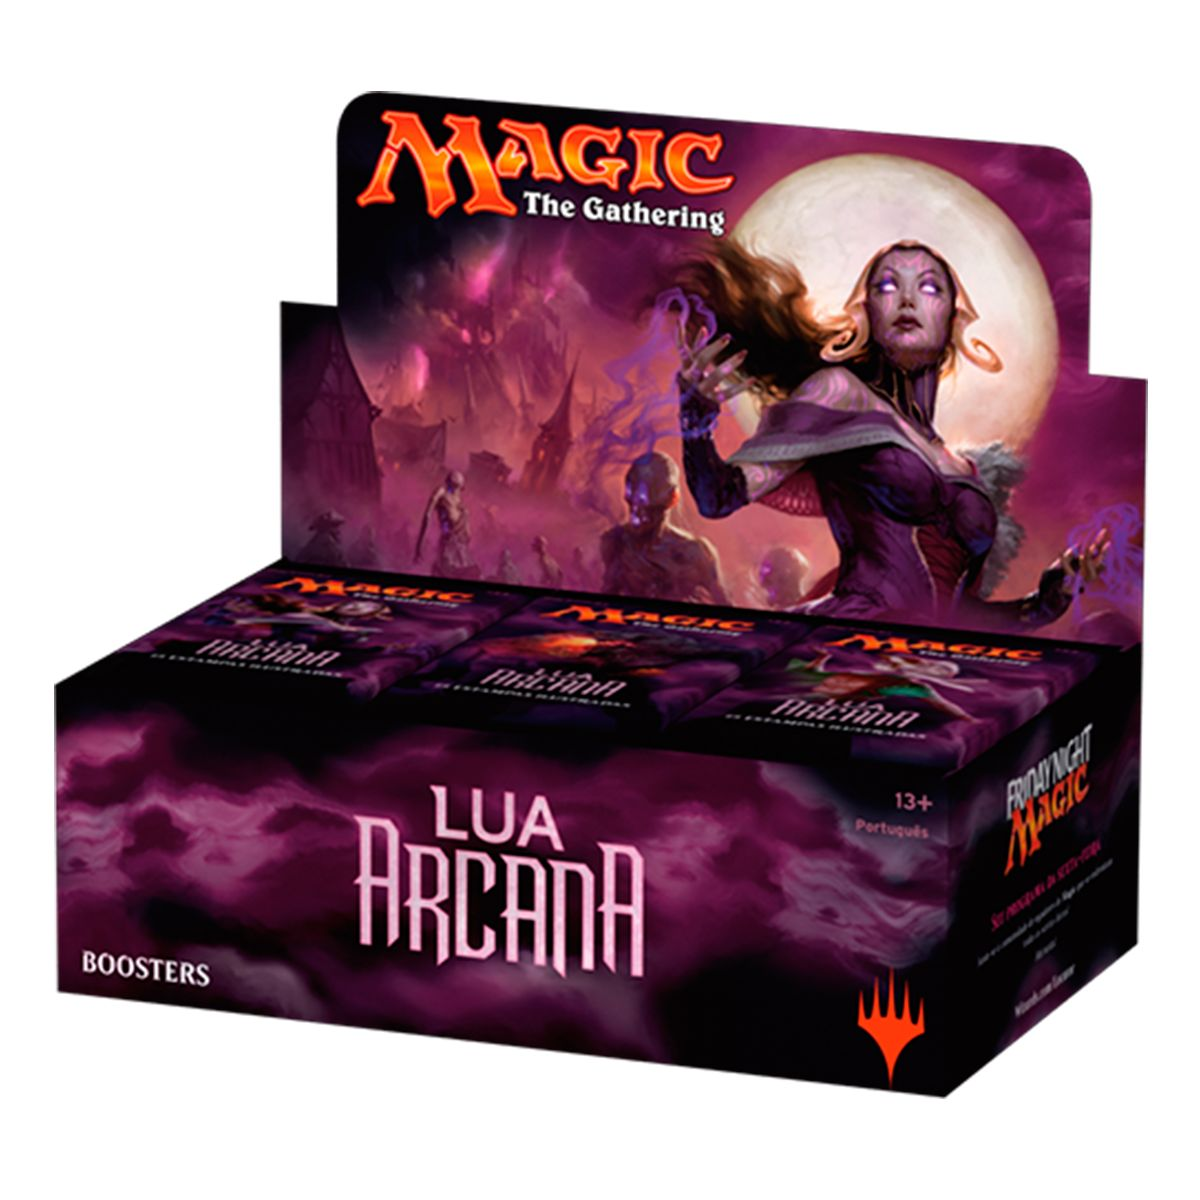 Magic The Gathering Box Booster Lua Arcana